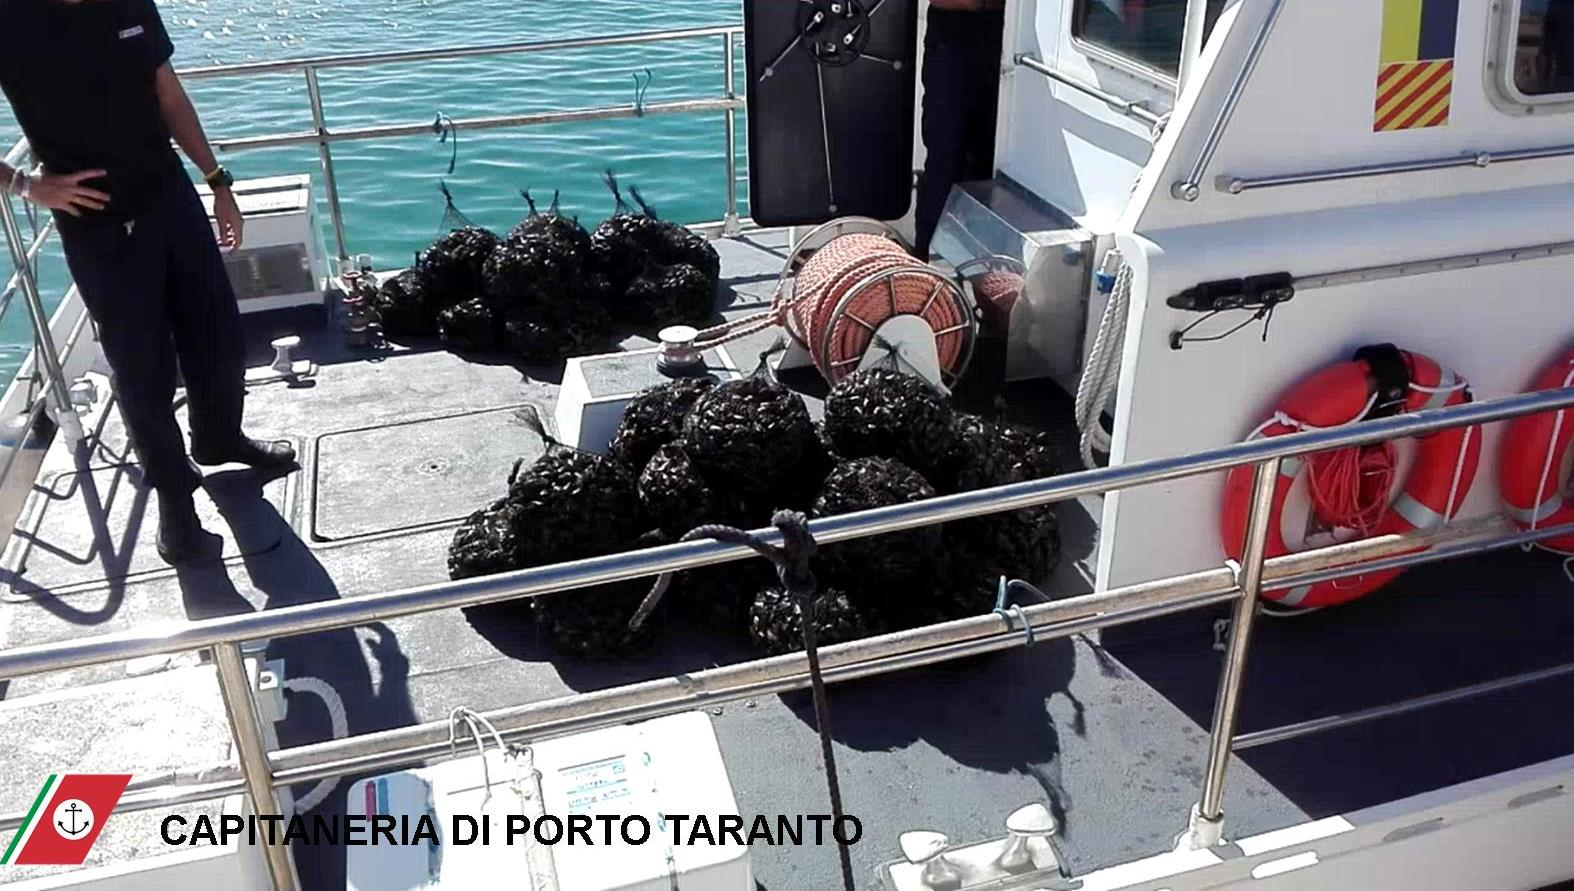 BioEcoGeo_Taranto_cozze